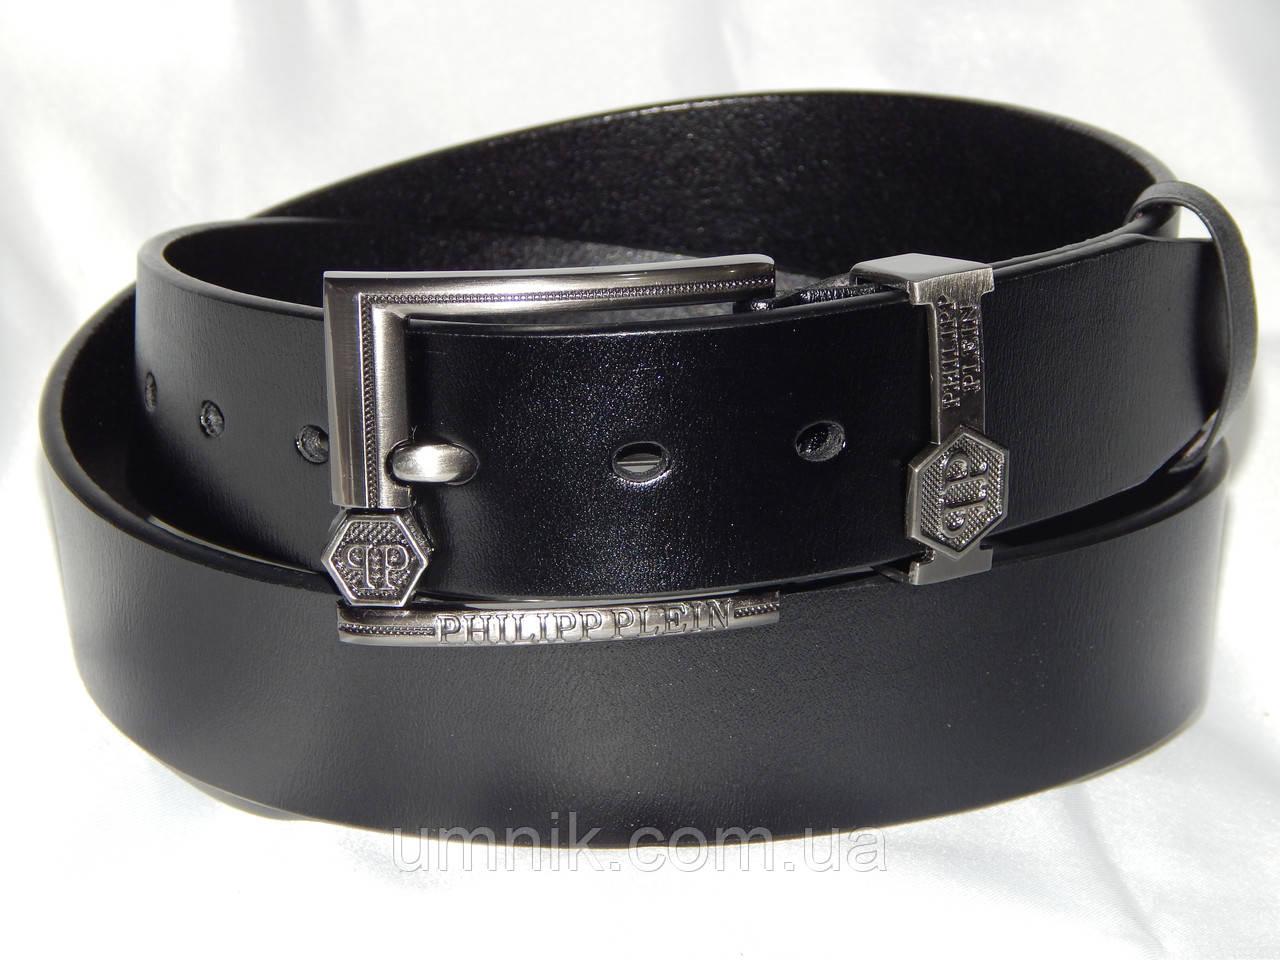 Ремень мужской кожаный PHILIPP PLEIN ширина 40 мм.930596